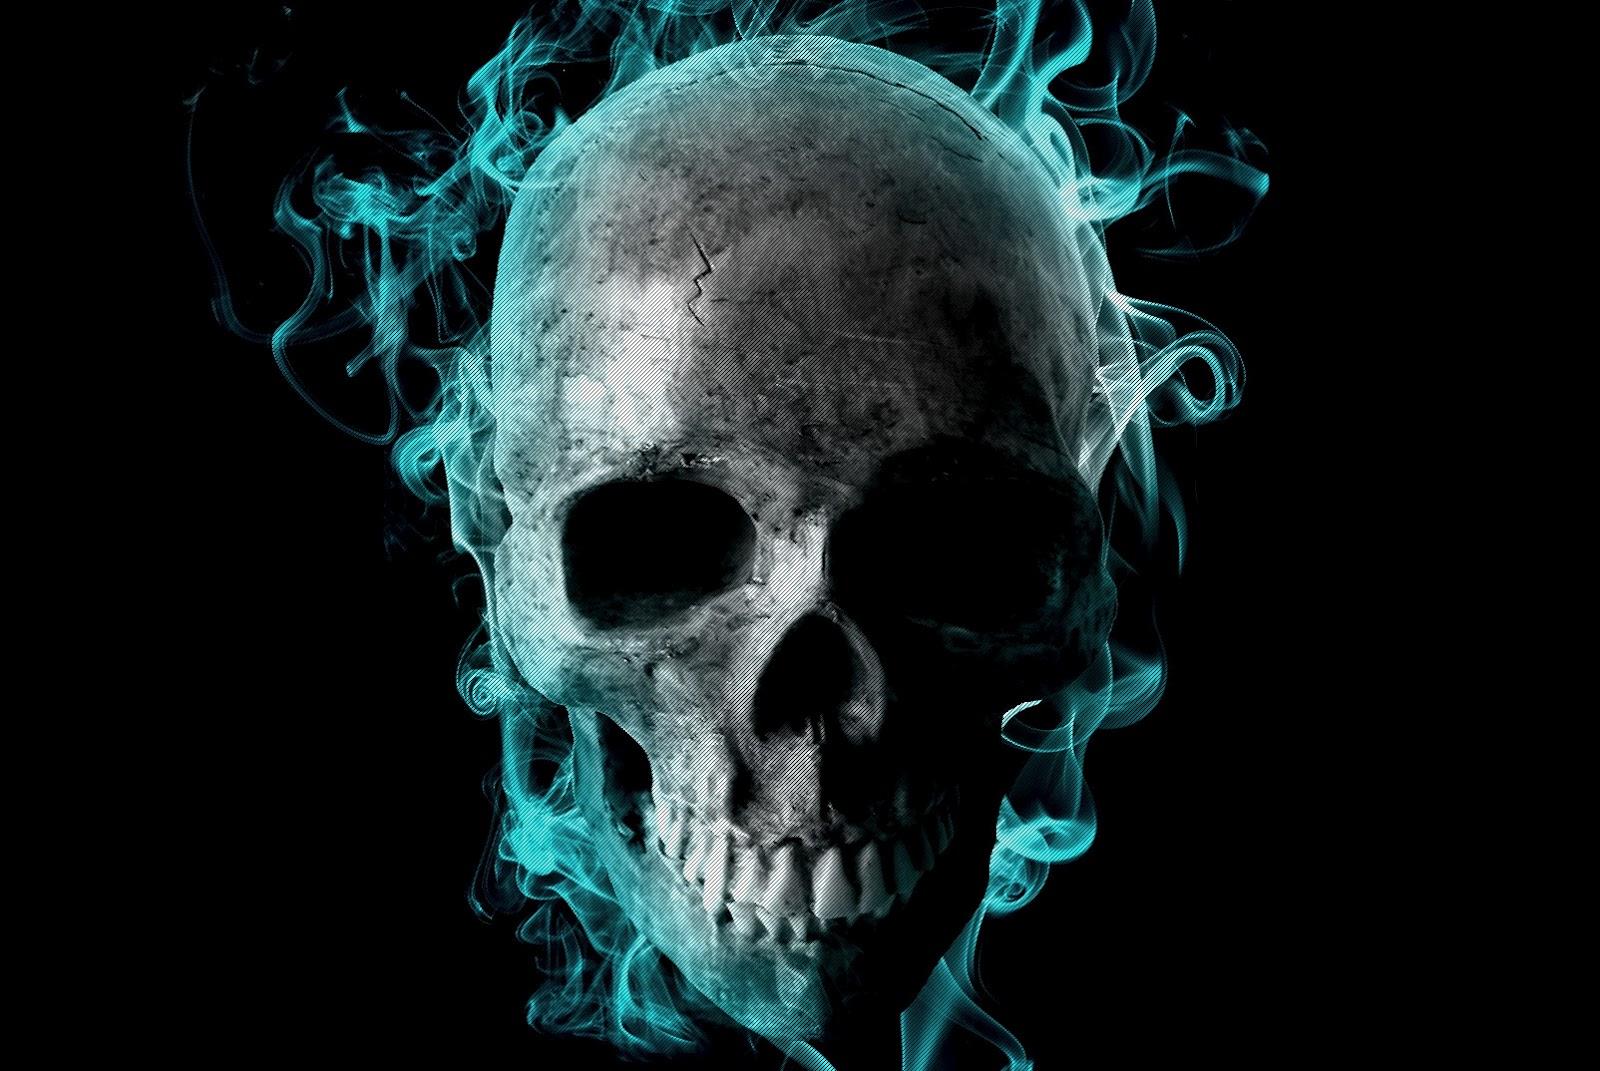 Beautiful HD Wallpapers Skull Wallpaper 1600x1071